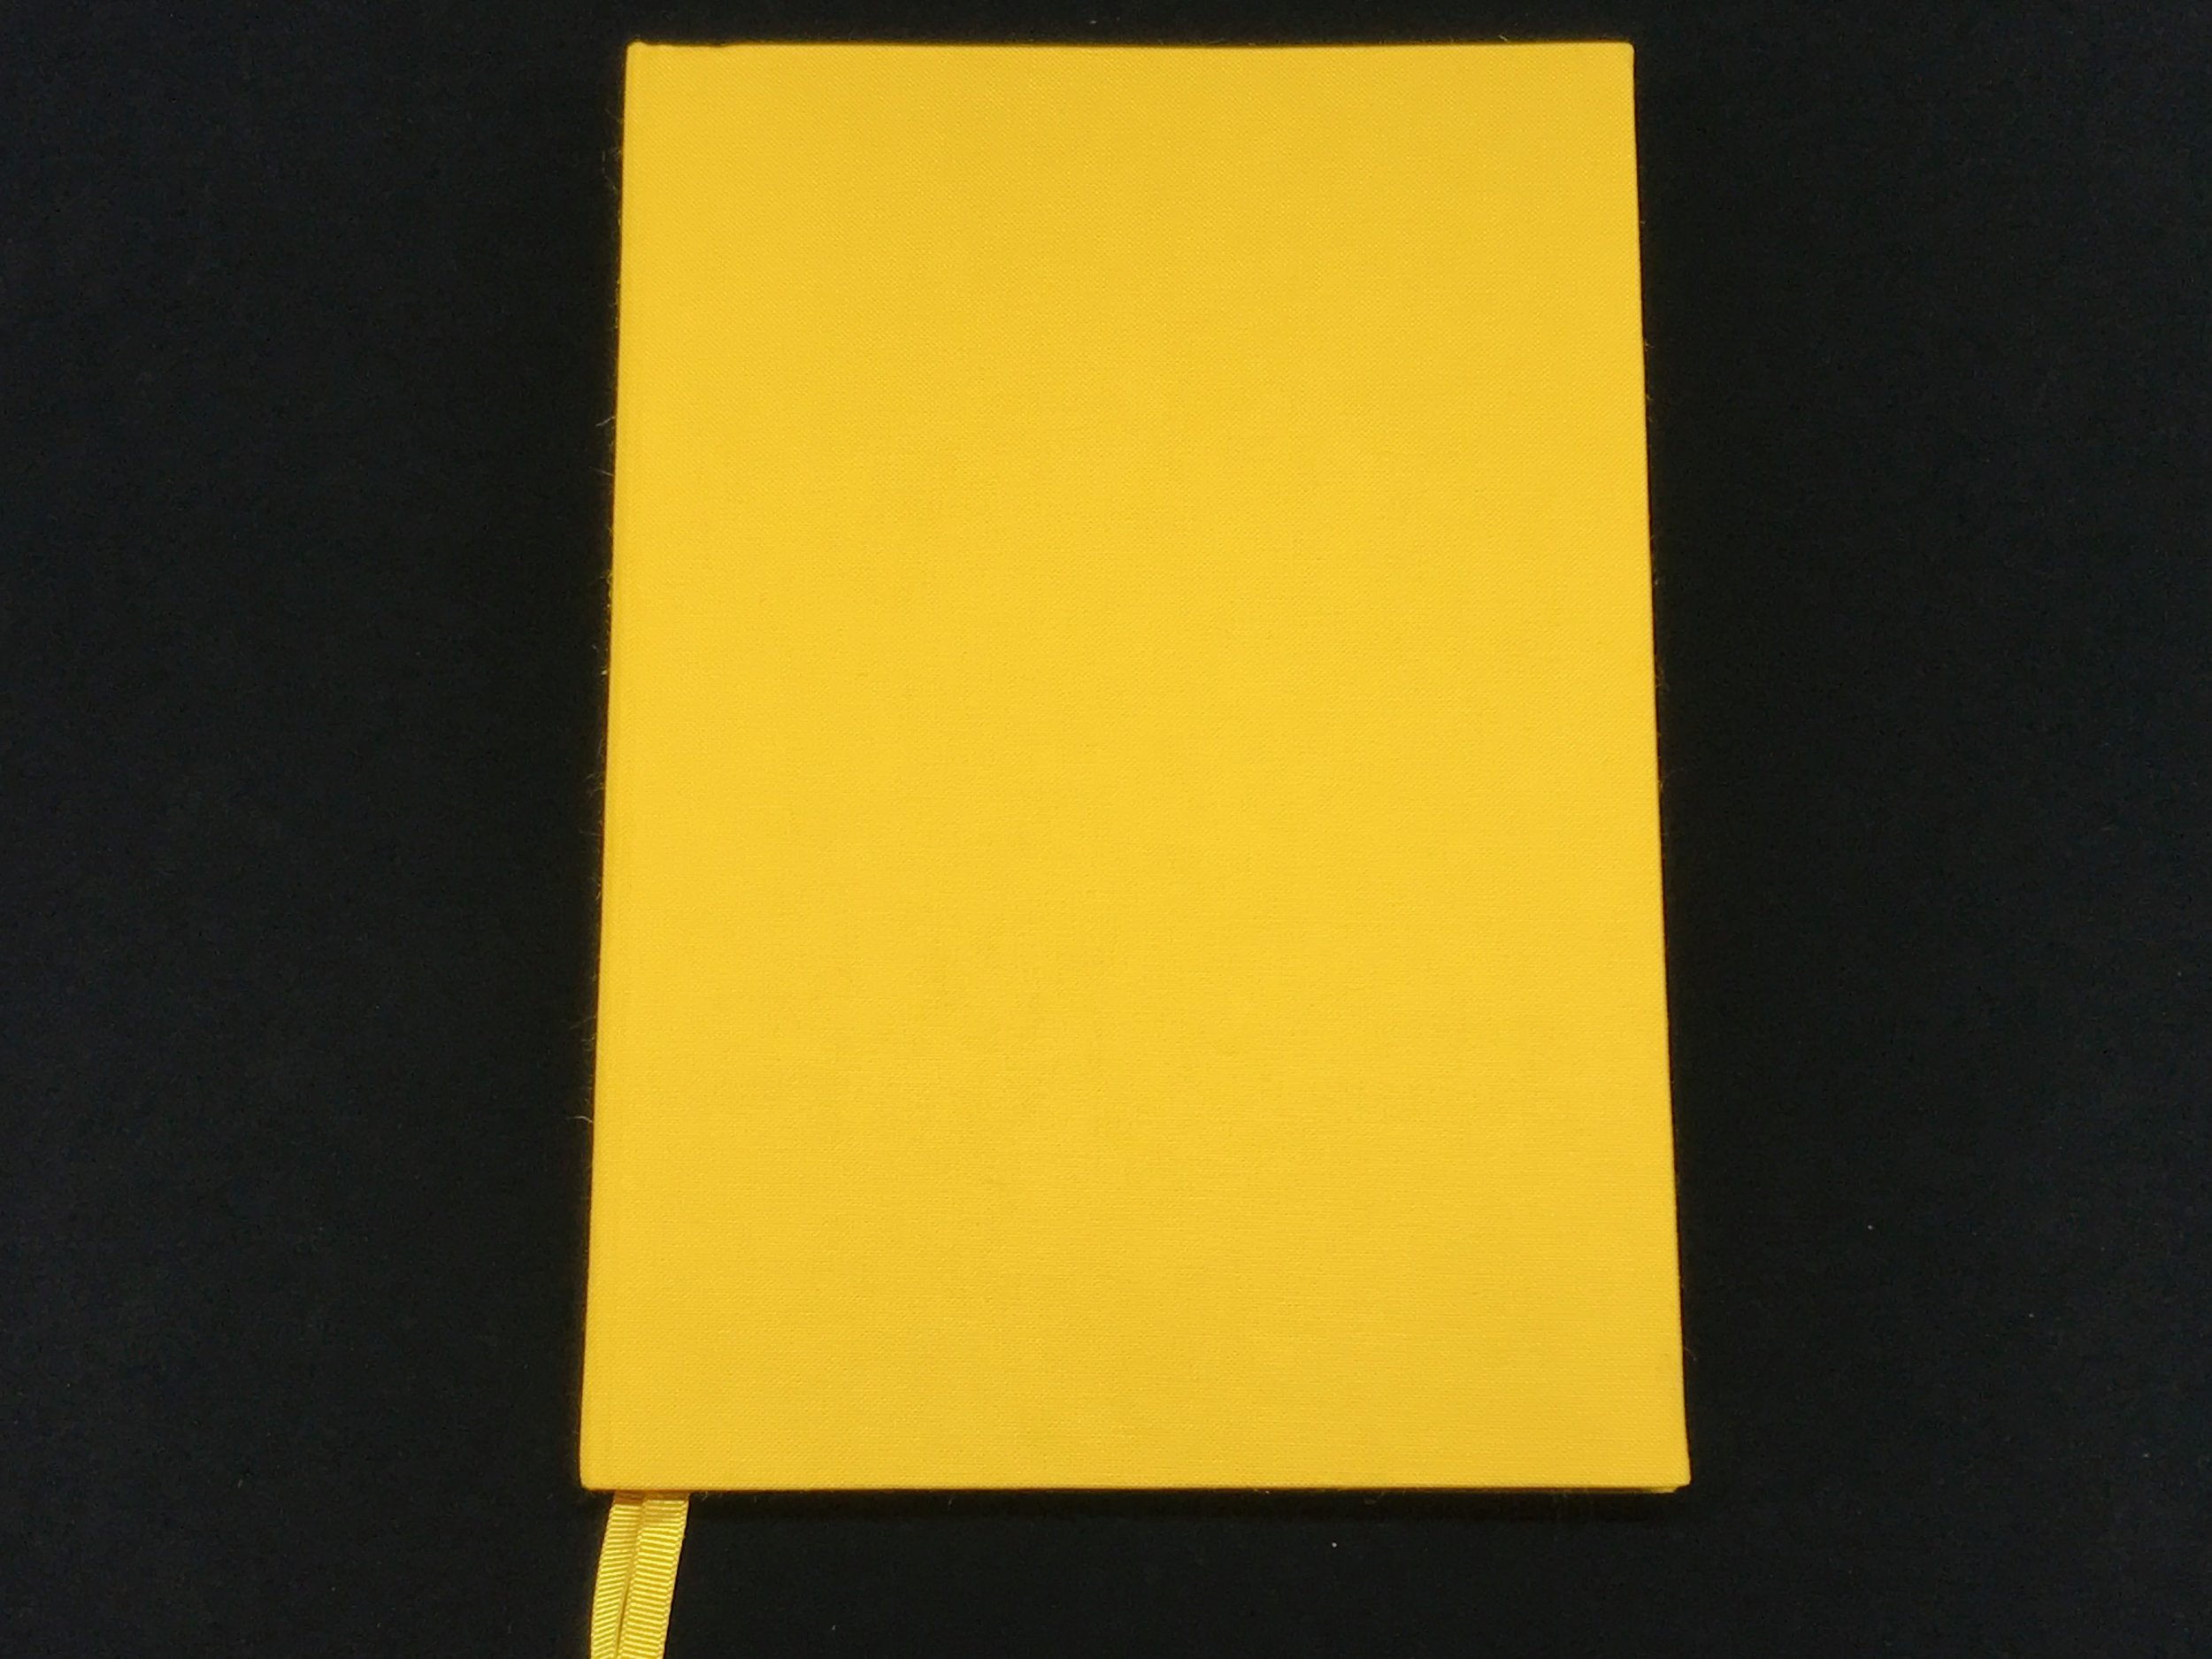 weskin-bookblock-notebook-2.jpg